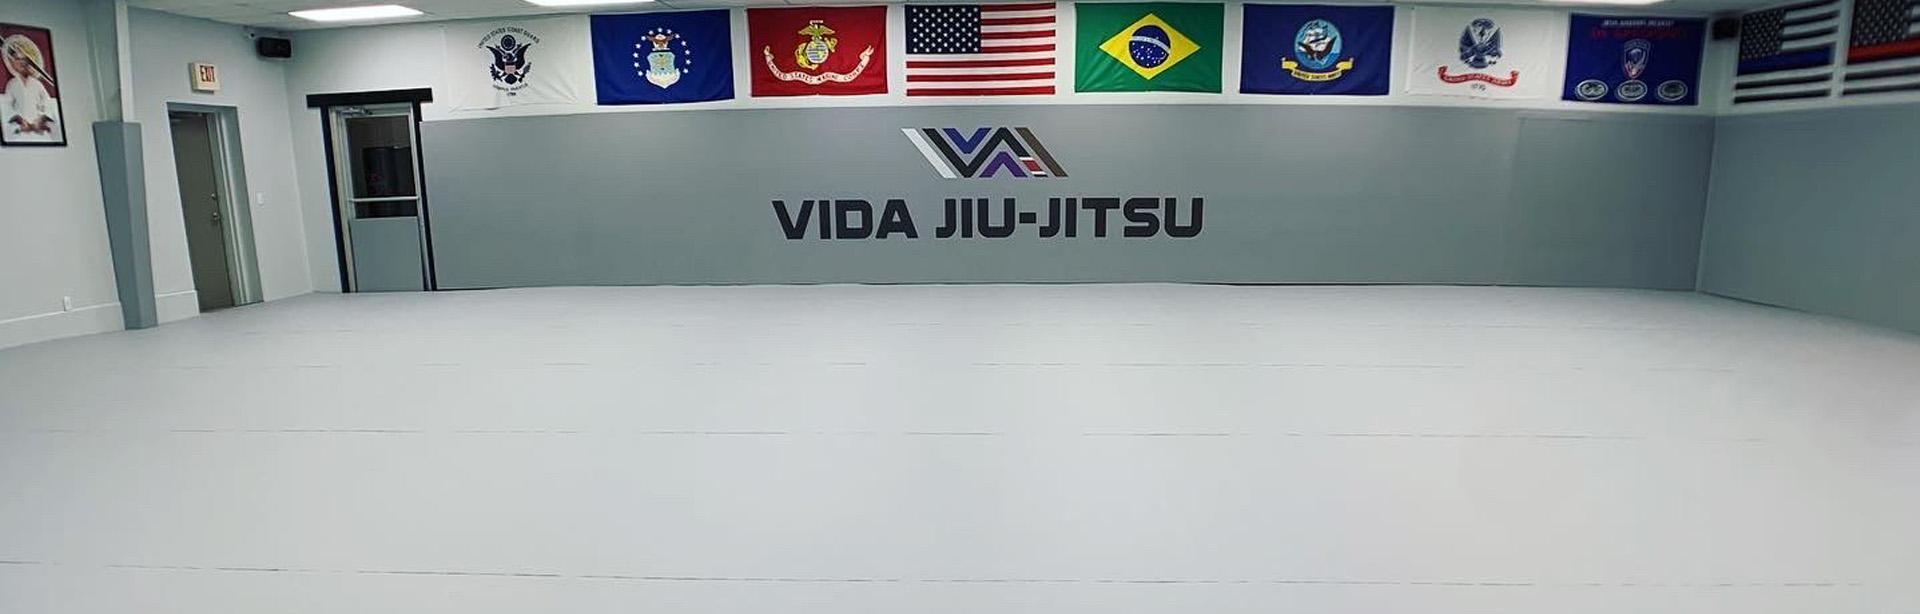 vida-bjj-header-home2